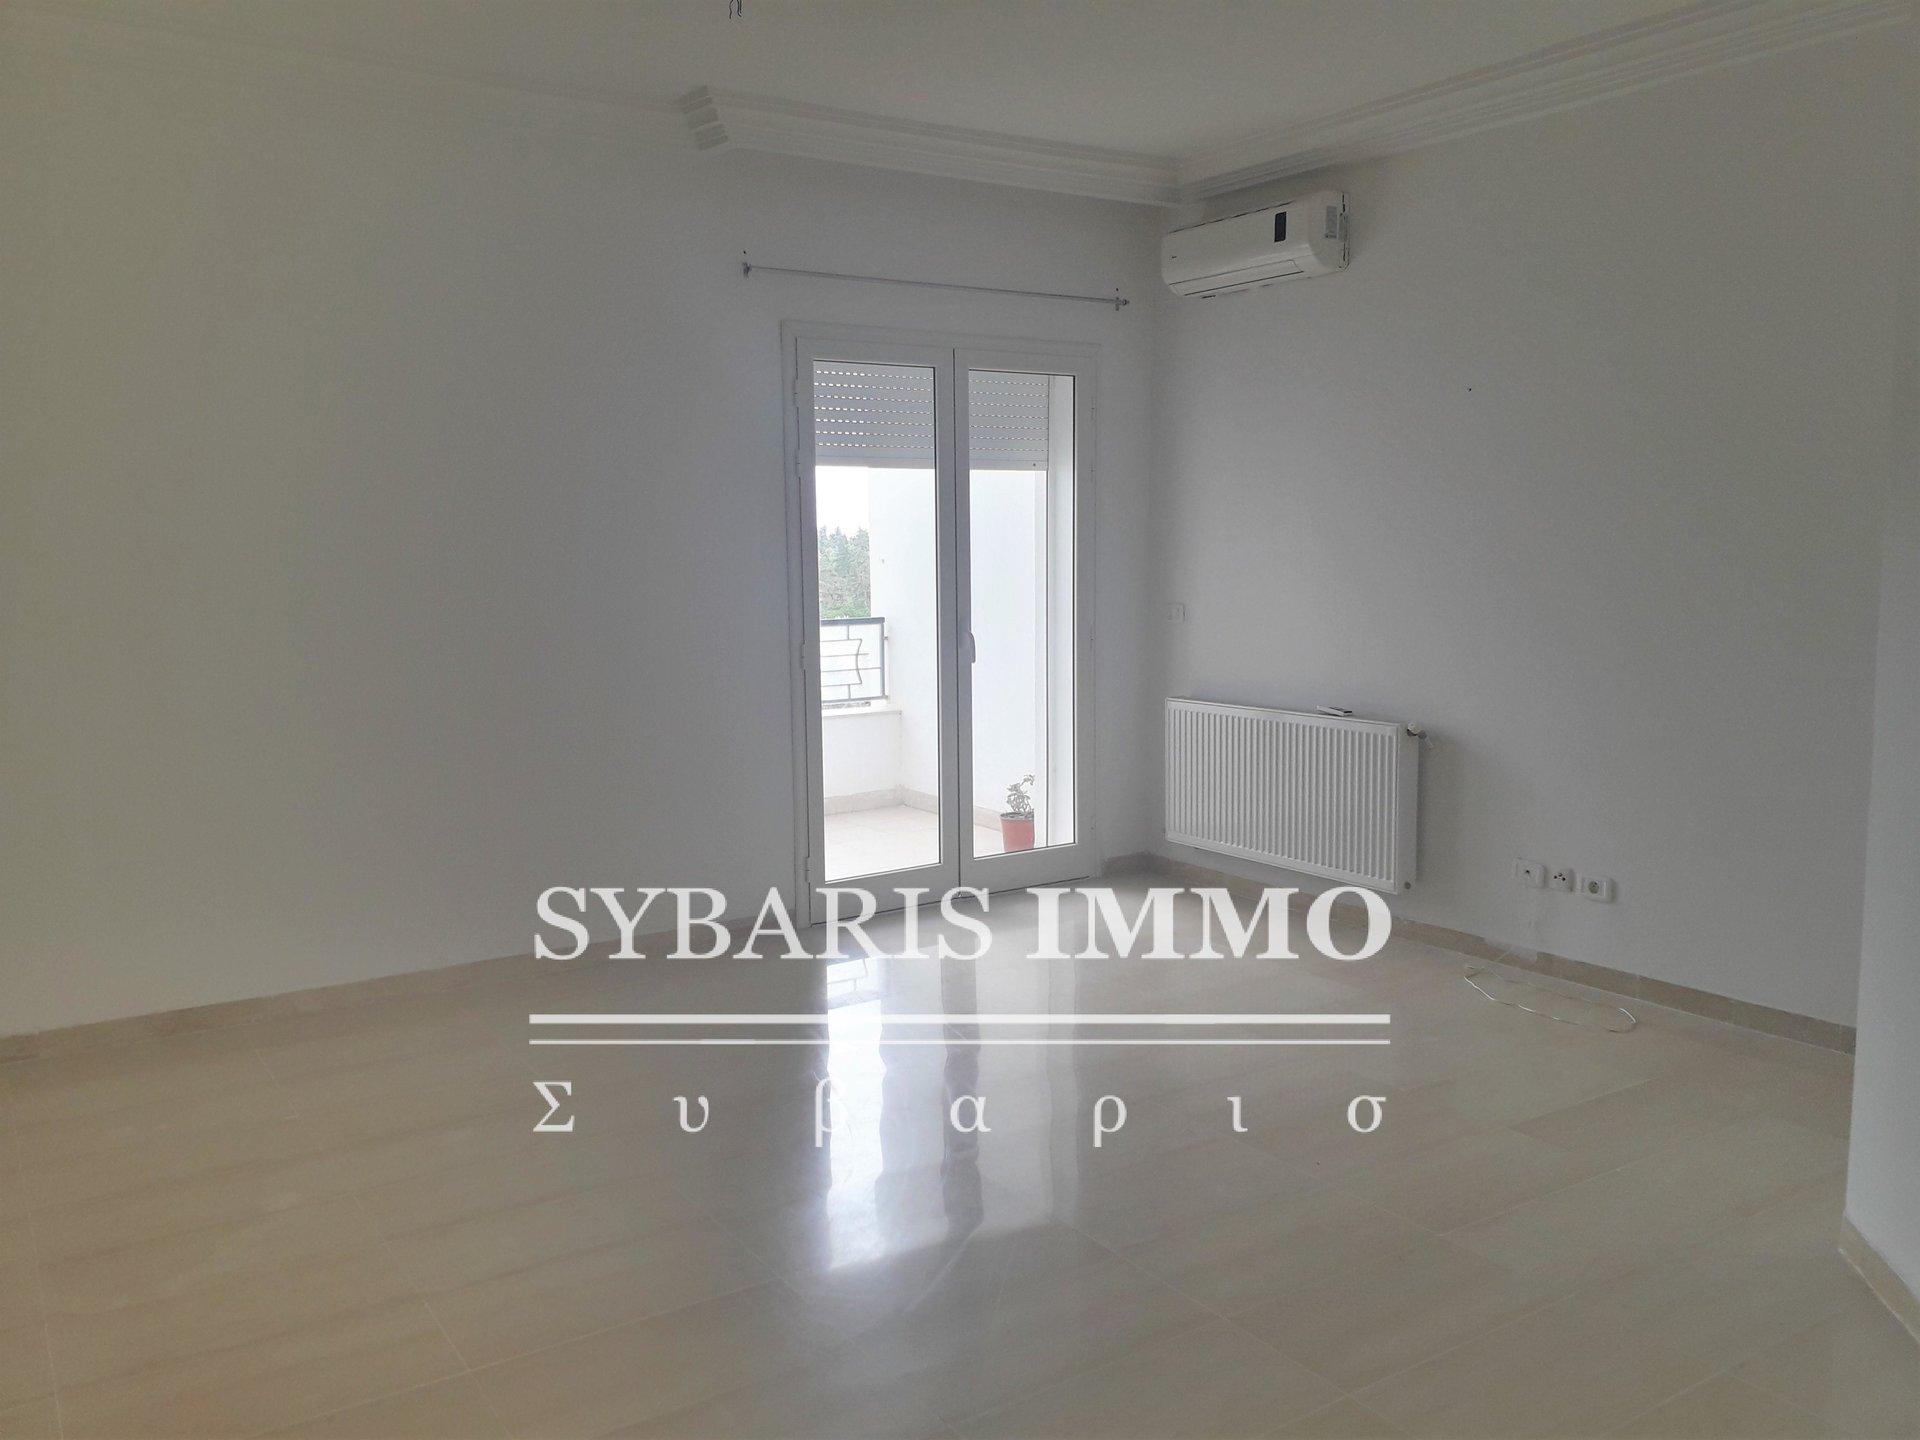 Vente appartement a la soukra - Tunis